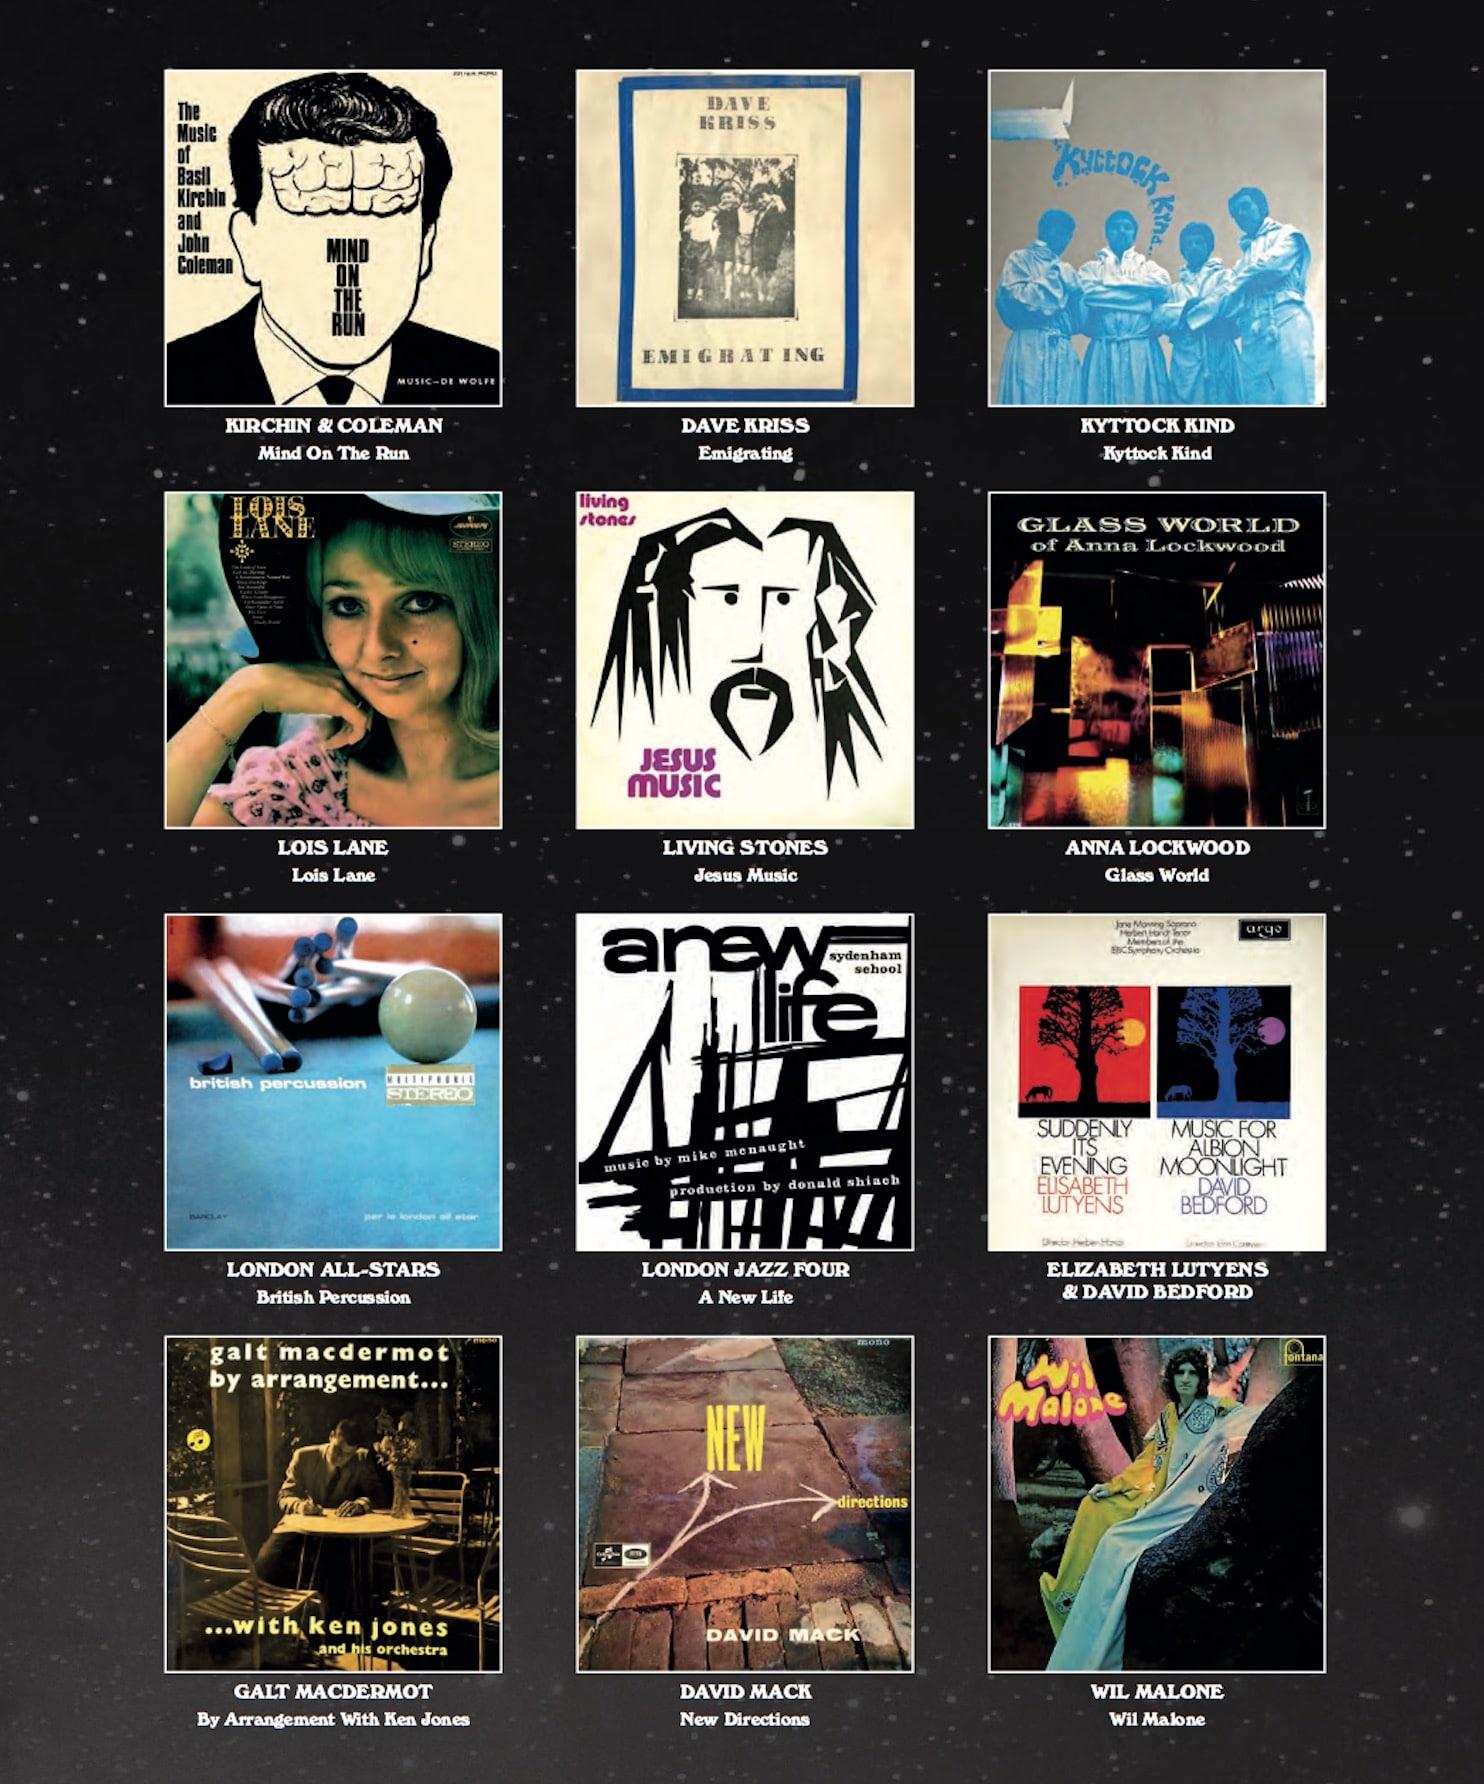 GALACTIC RAMBLE: 60s And 70s UK Music